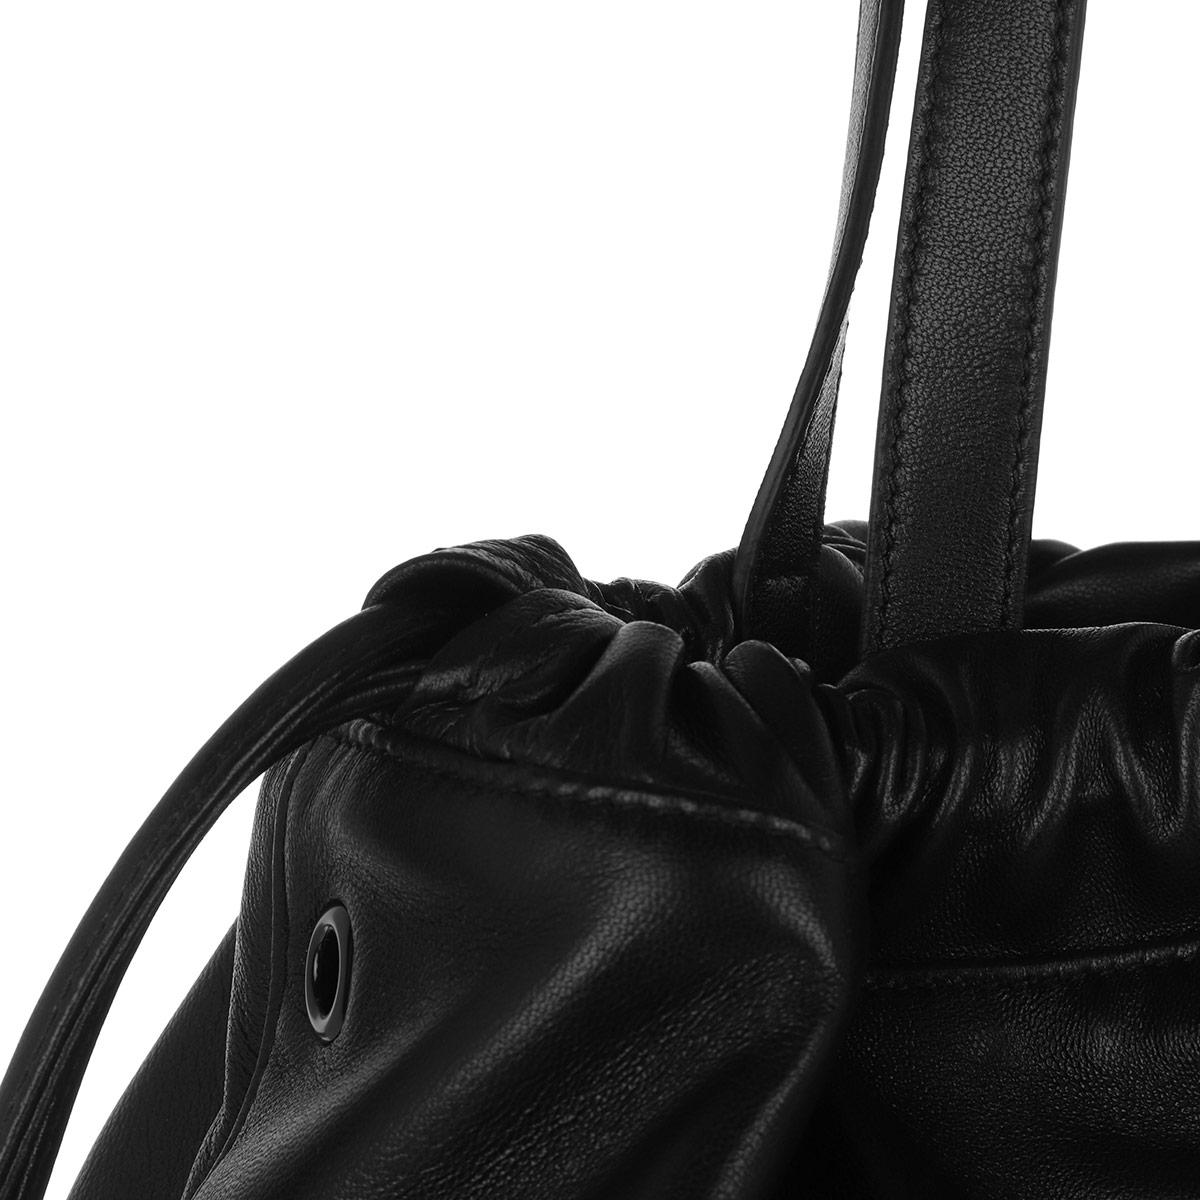 100fbf9f4 Saint Laurent - Harlem Shopping Bag Lambskin Black - Lyst. View fullscreen